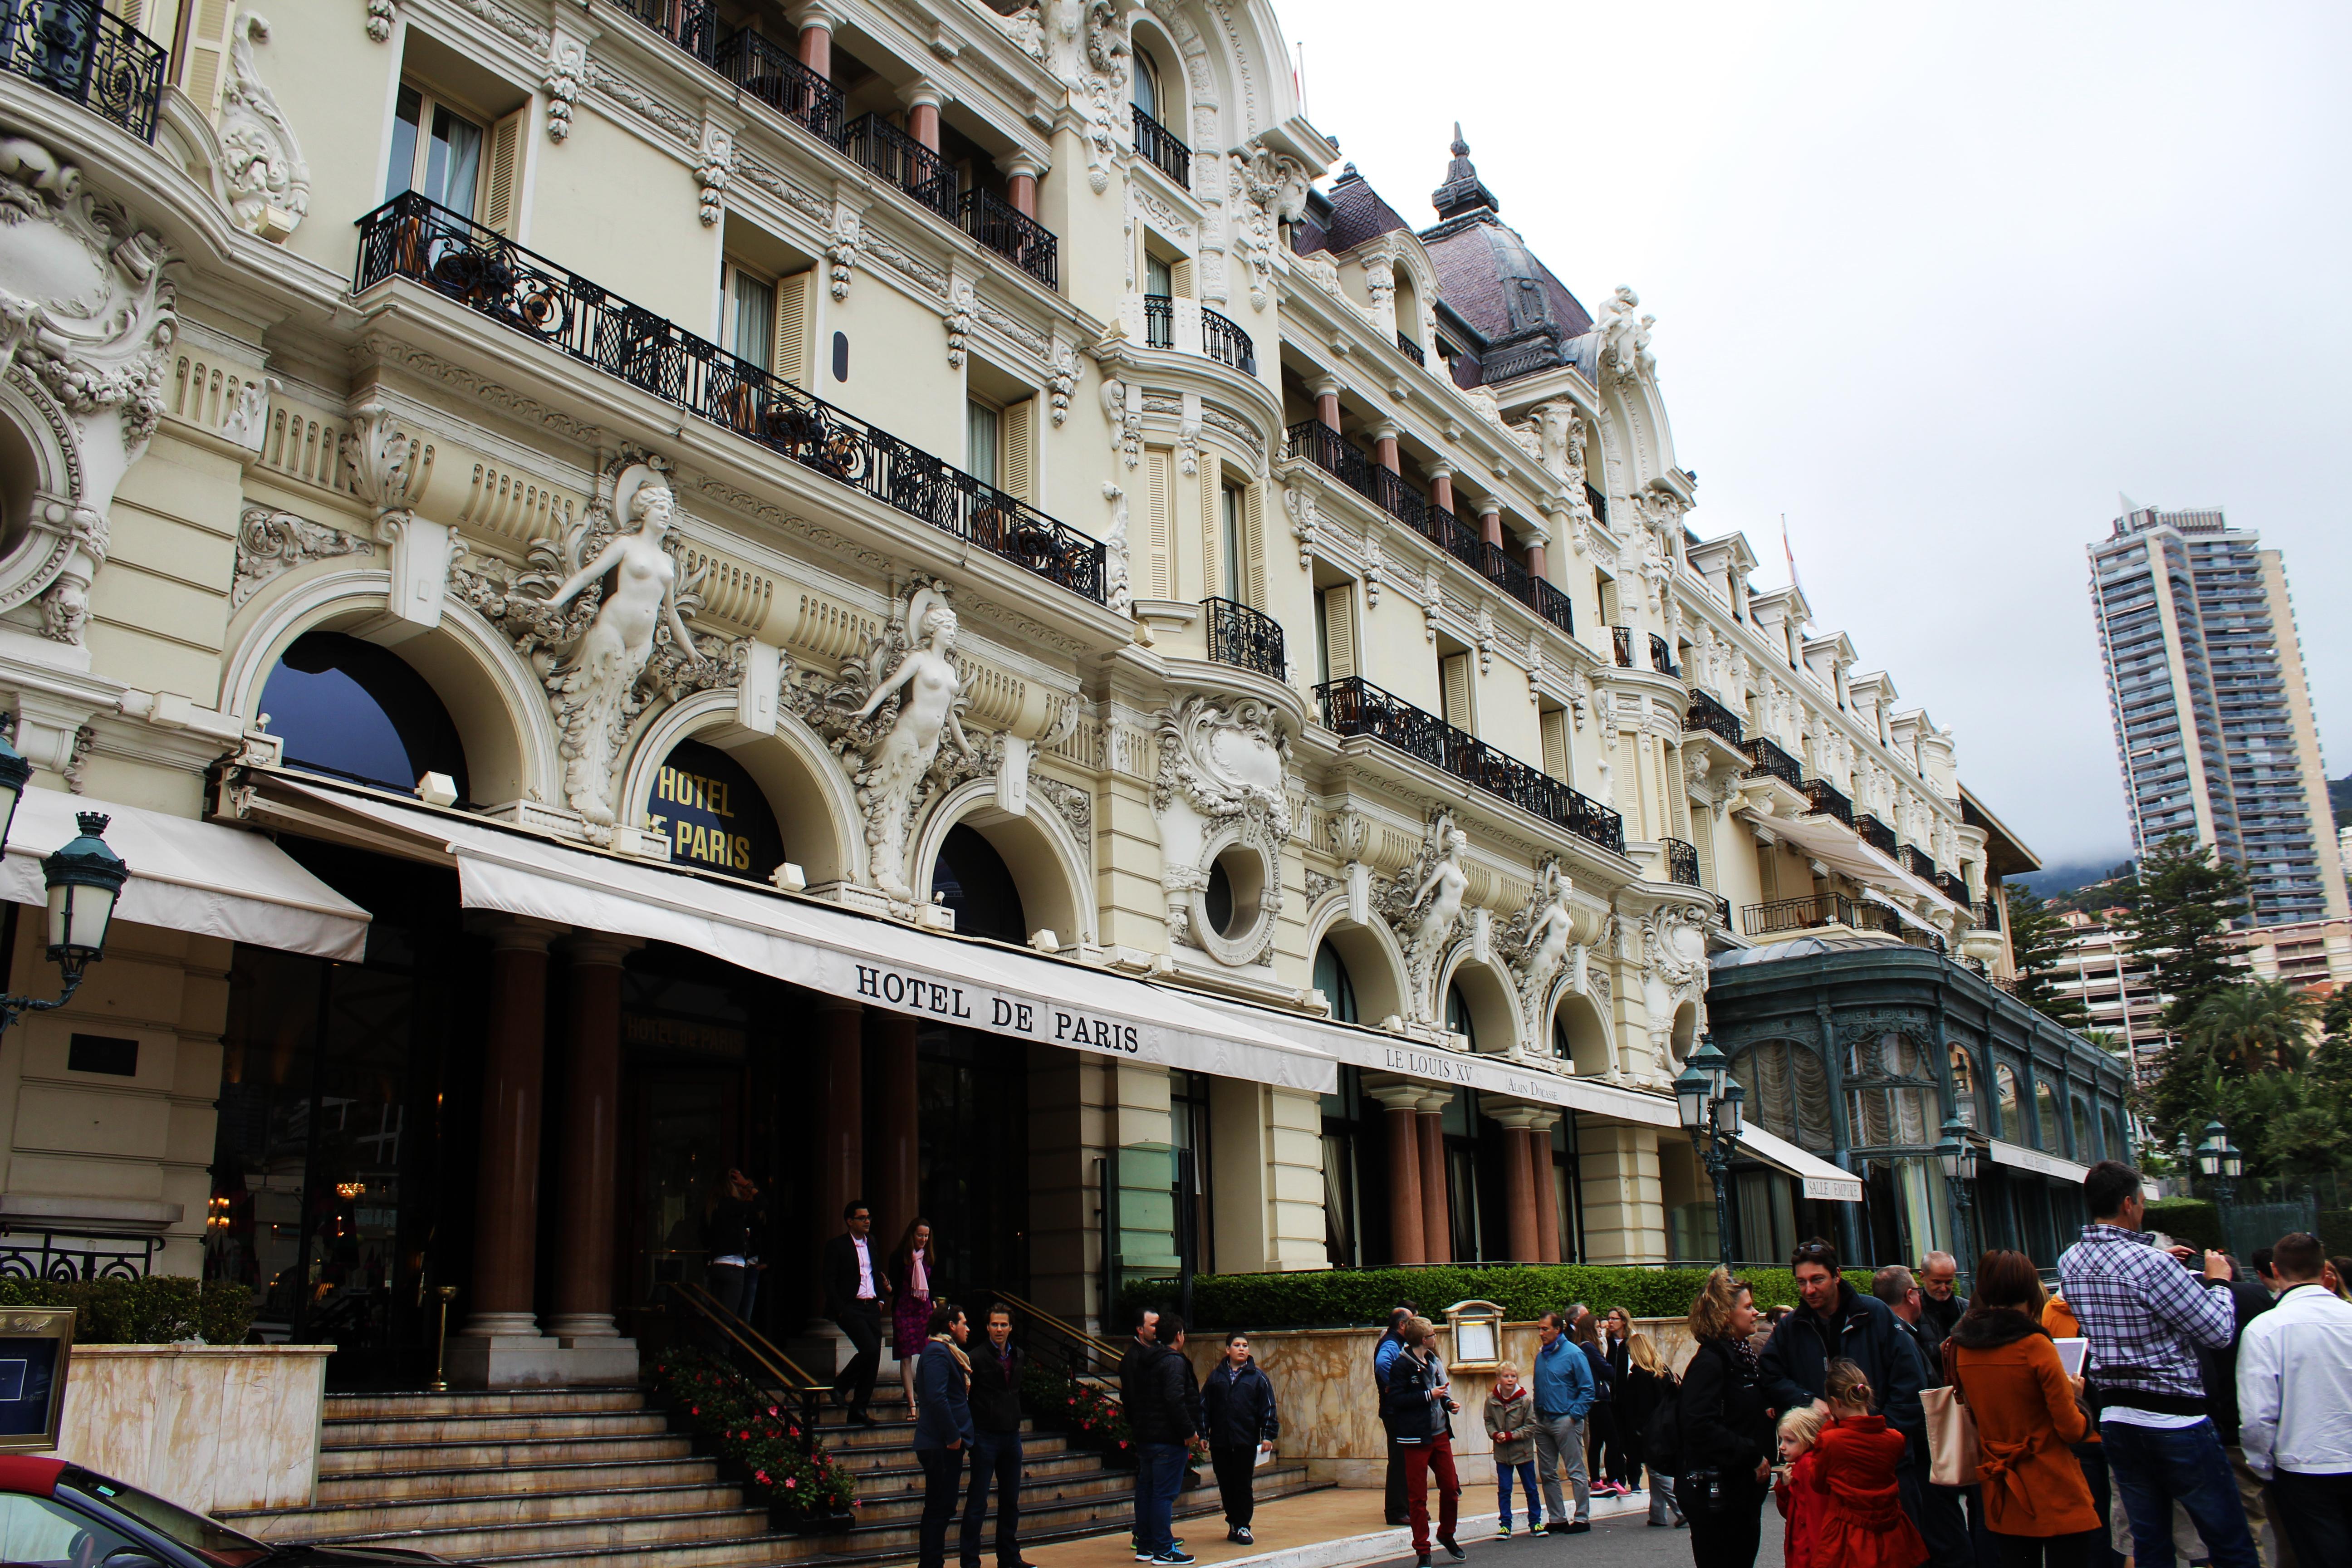 From nice to monaco emilyairheart for Hotel de paris